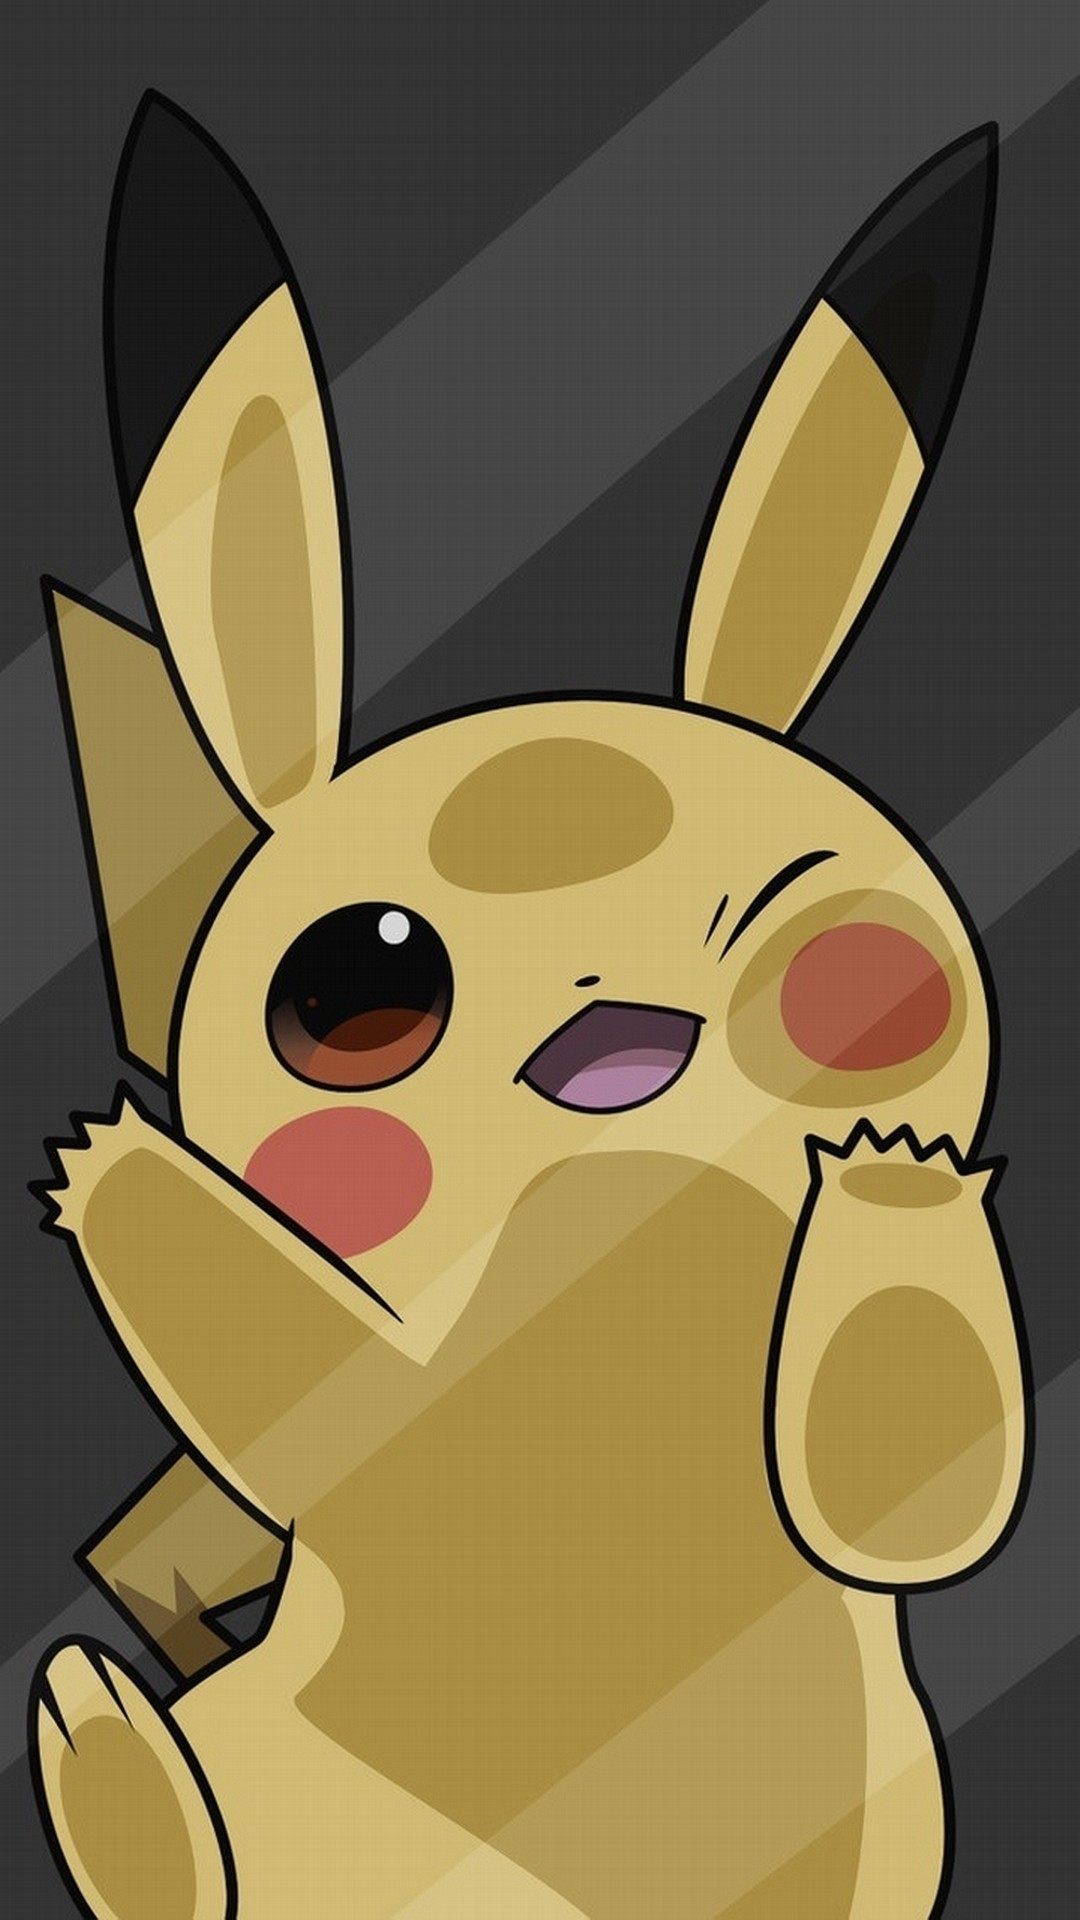 Pokemon Mobile wallpaper collection